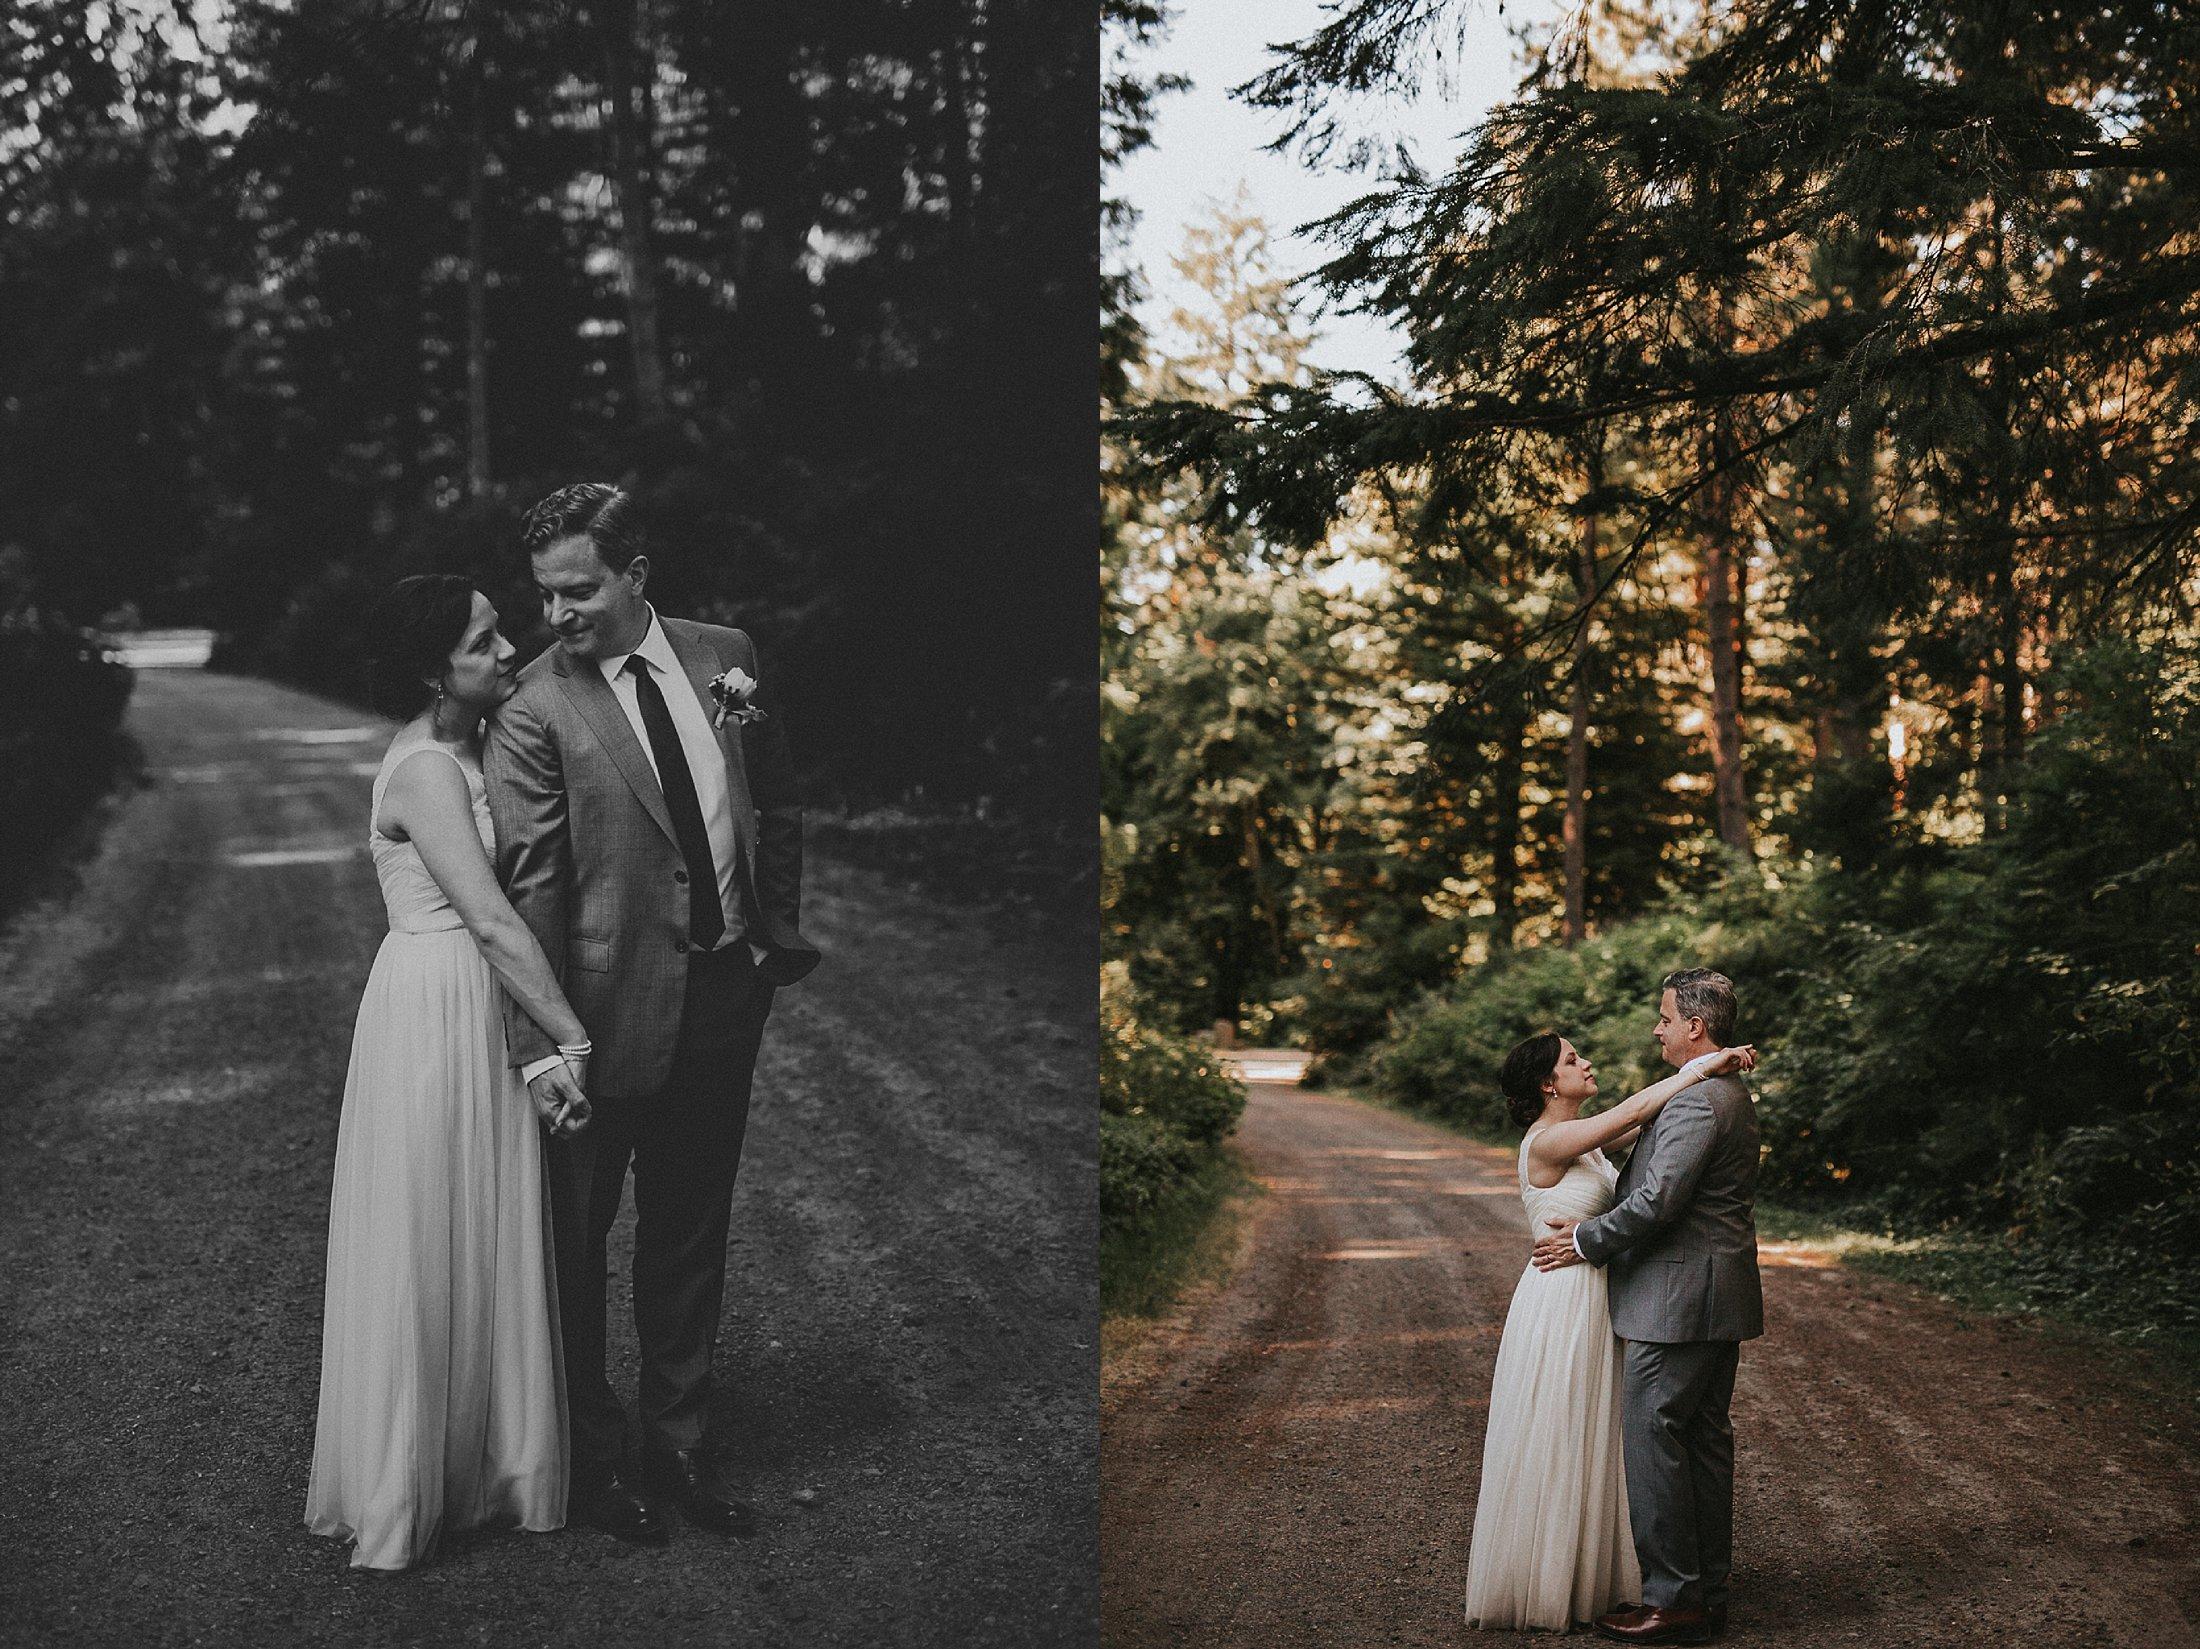 wedding-photojournalists-nashville-tn-16.jpg